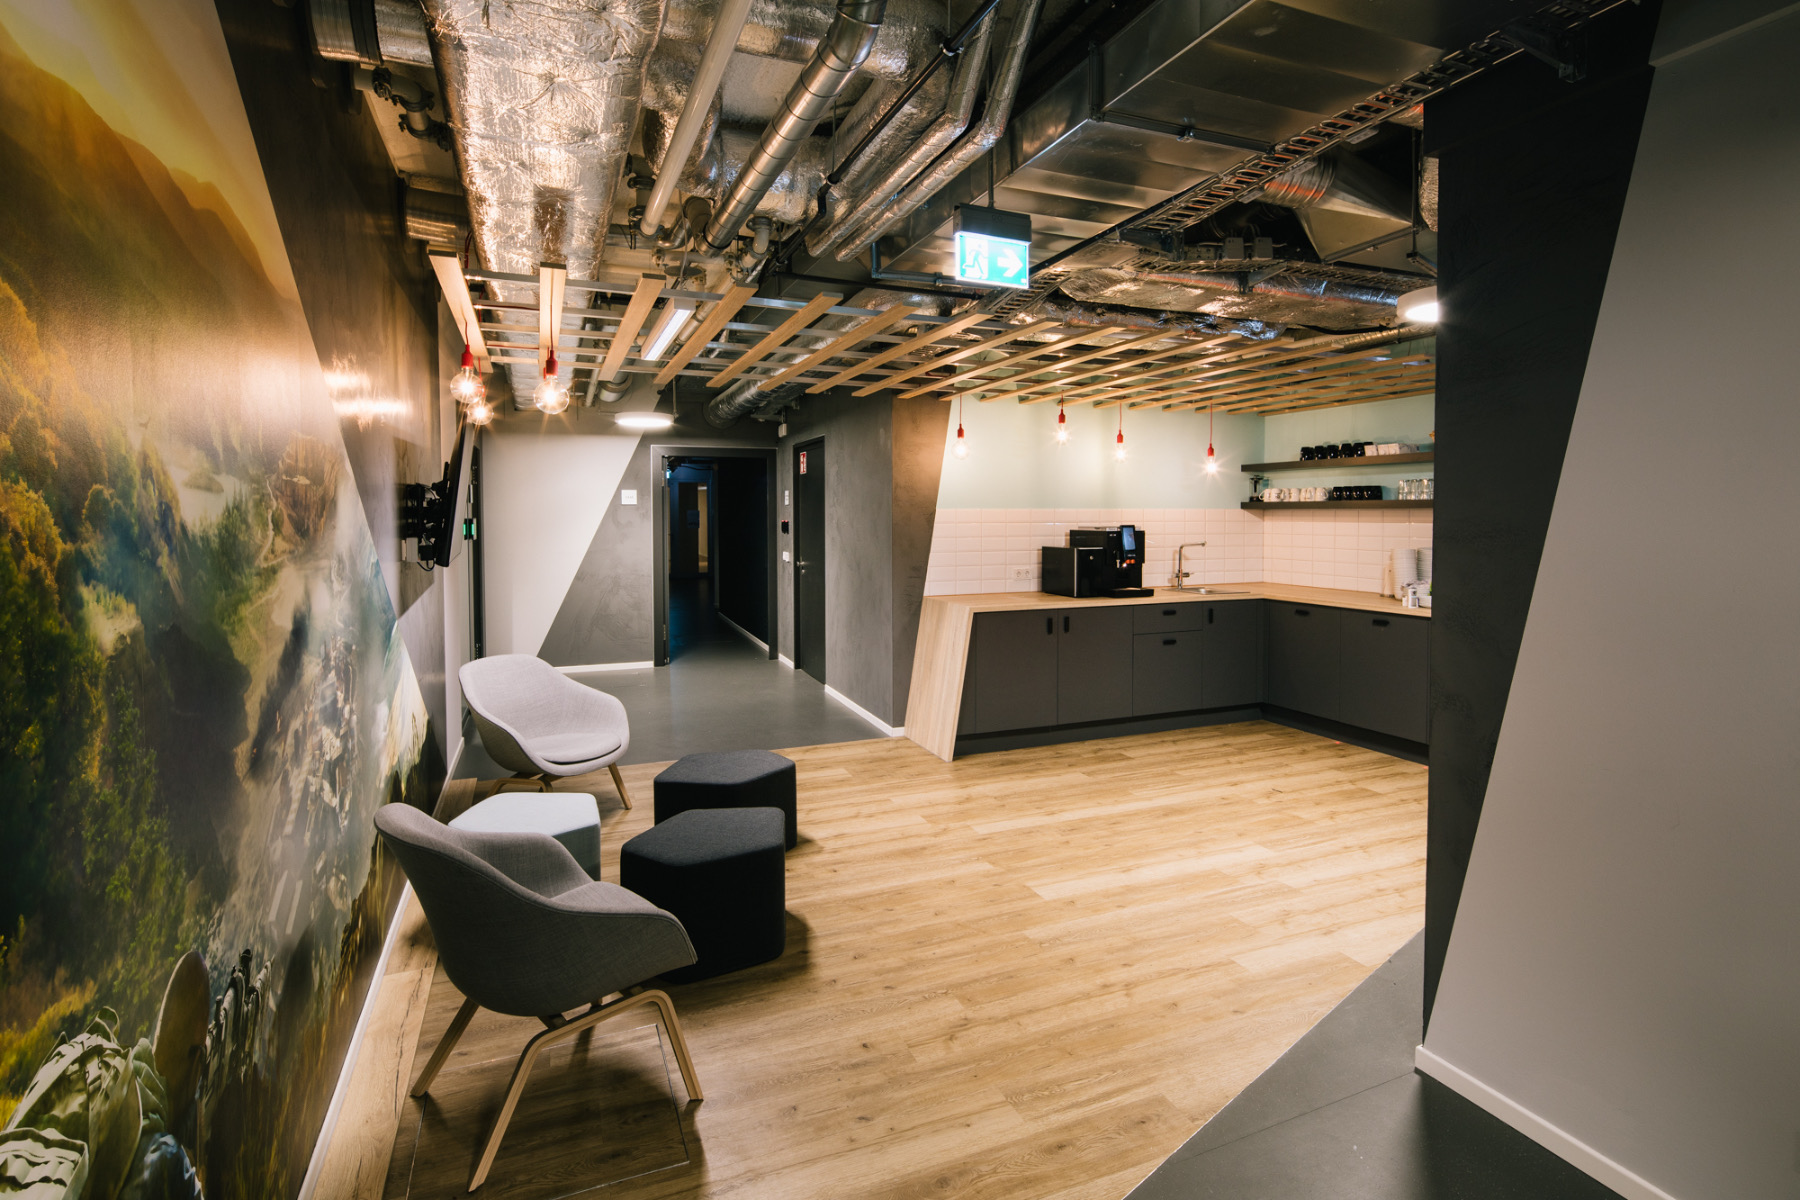 ubisoft-dusseldorf-office-5